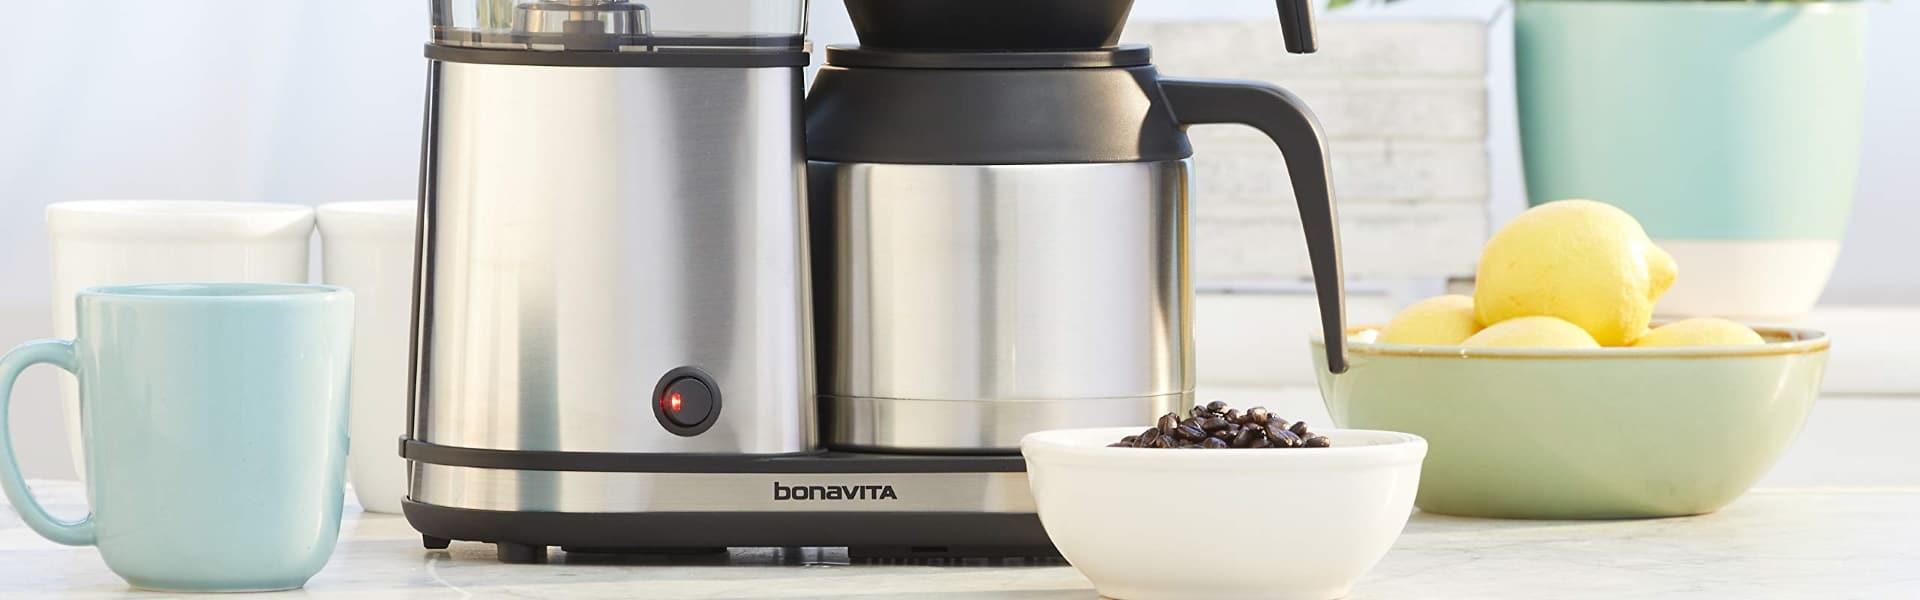 Best Bonavita Coffee Makers [Apr. 2020] – Detailed Reviews